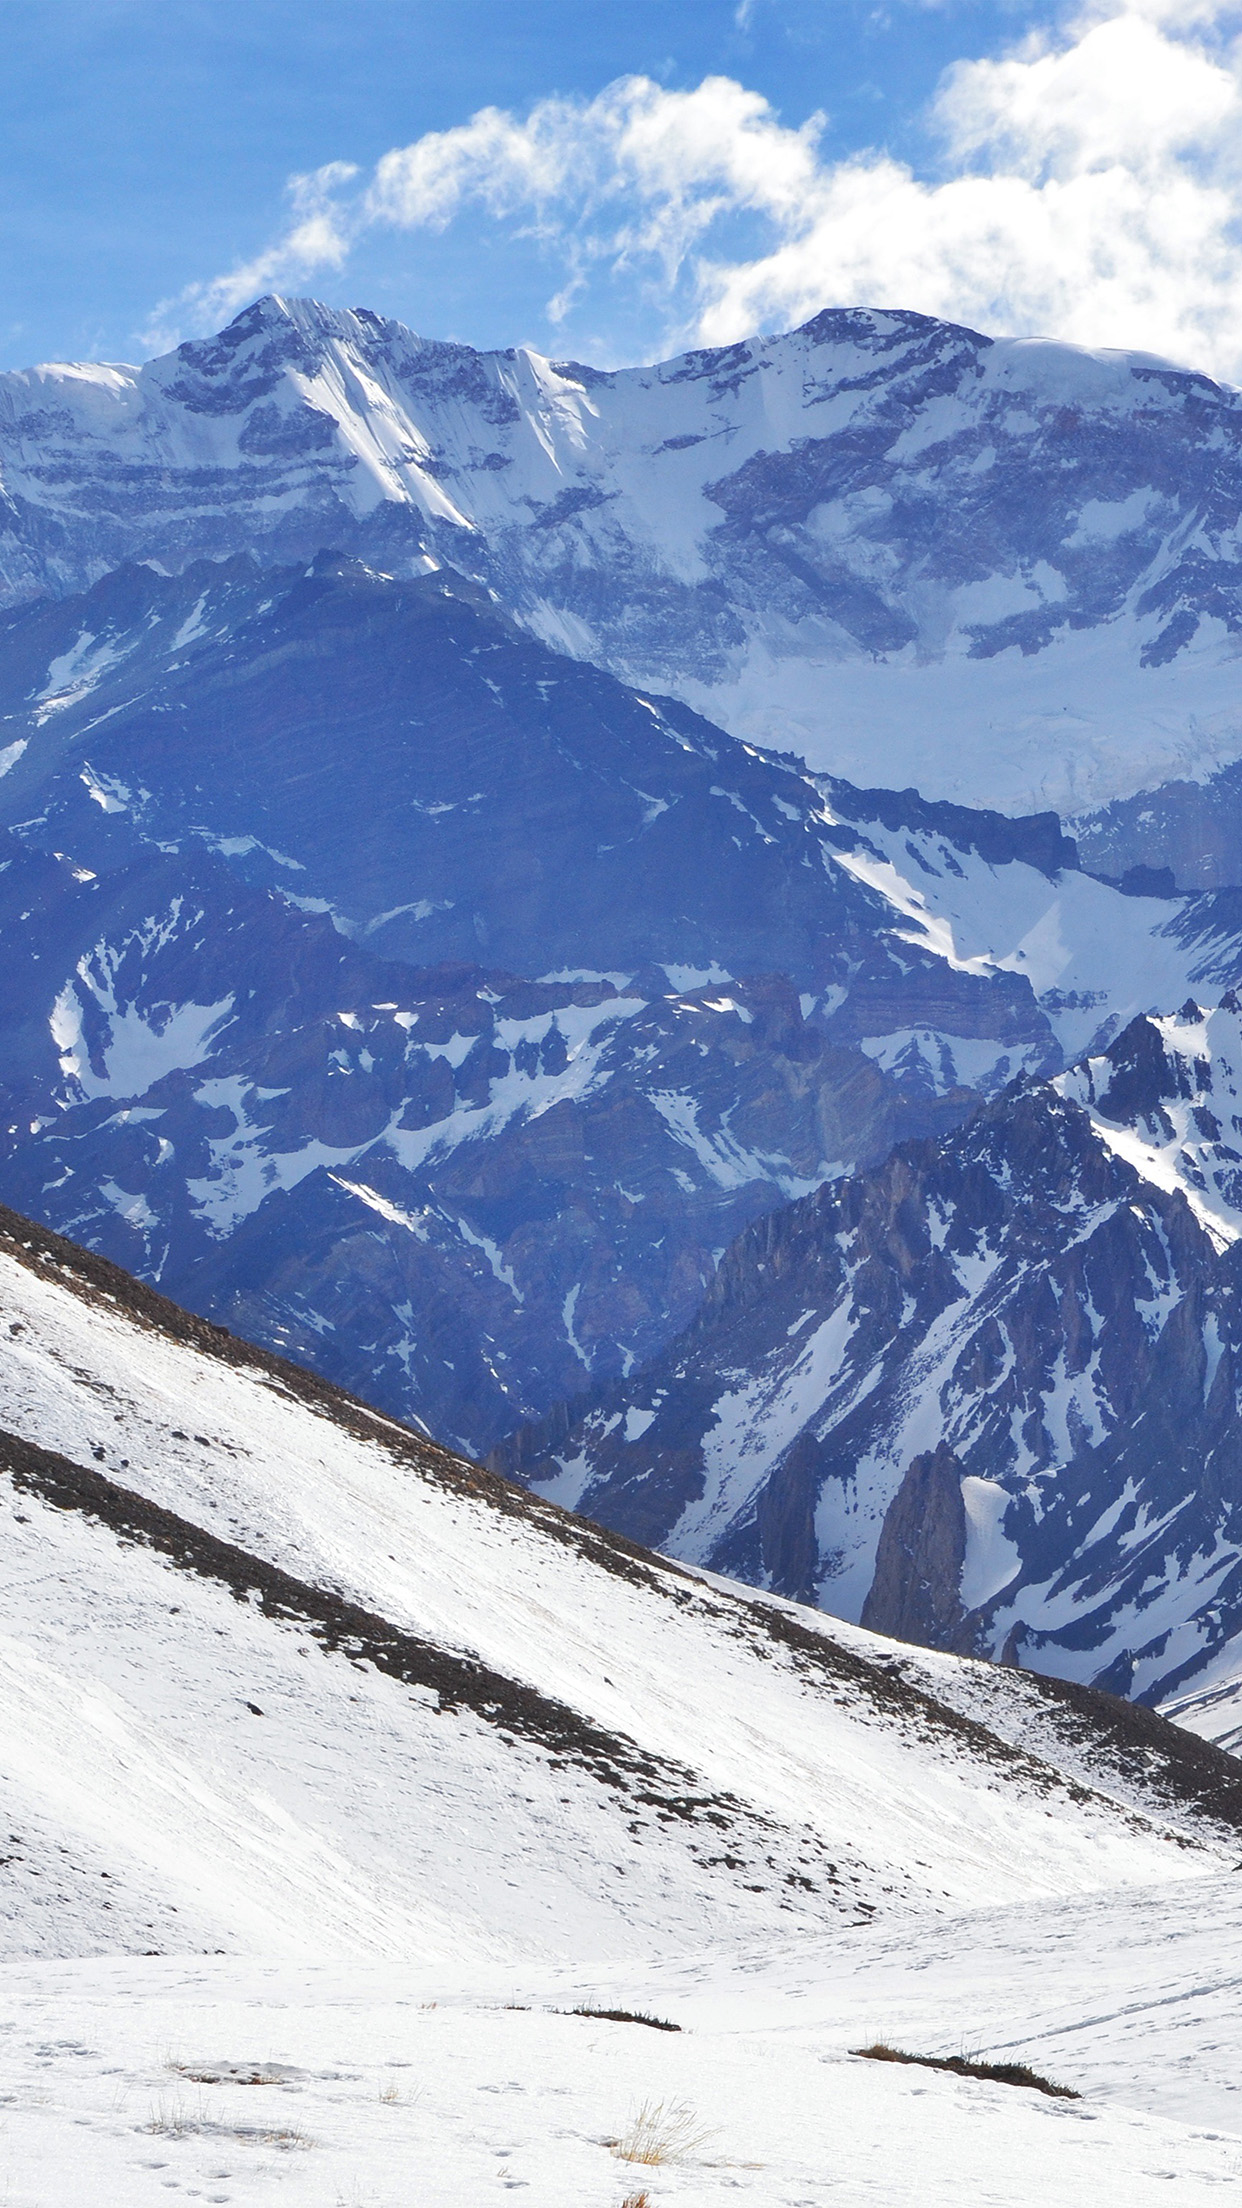 Winter mountains iphone wallpaper